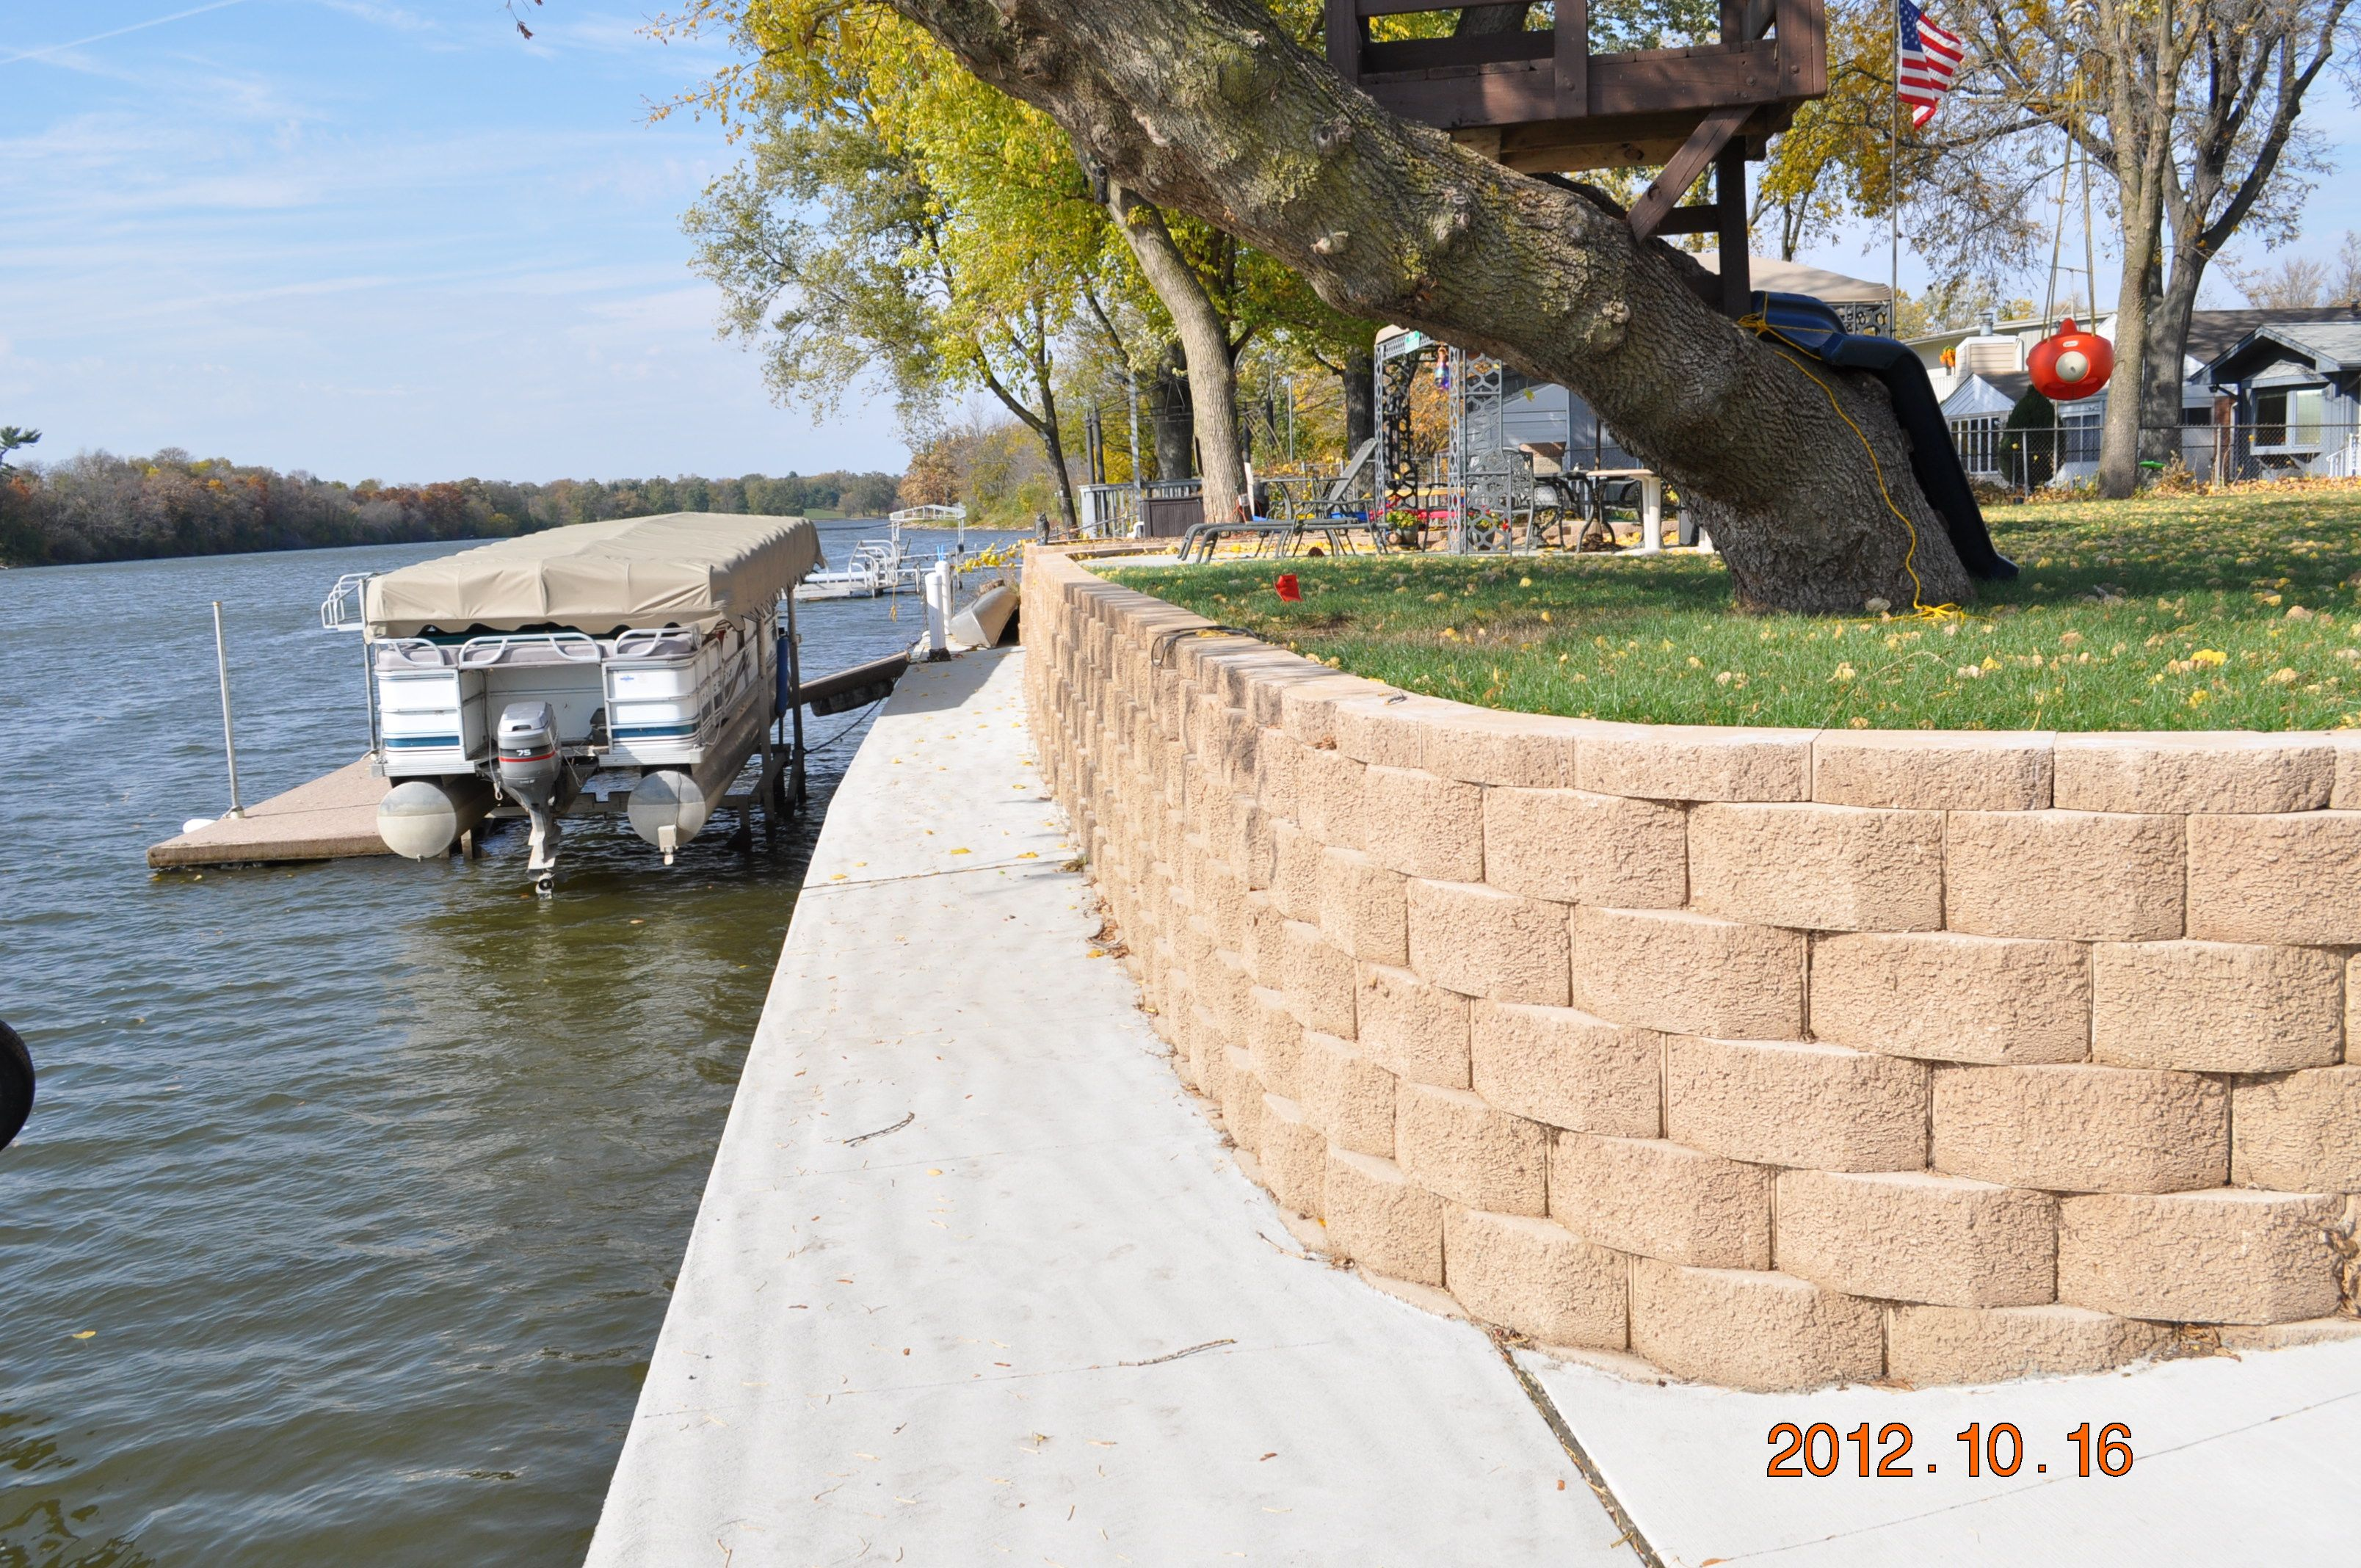 Rockford retaining wall built with interlocking pavers.